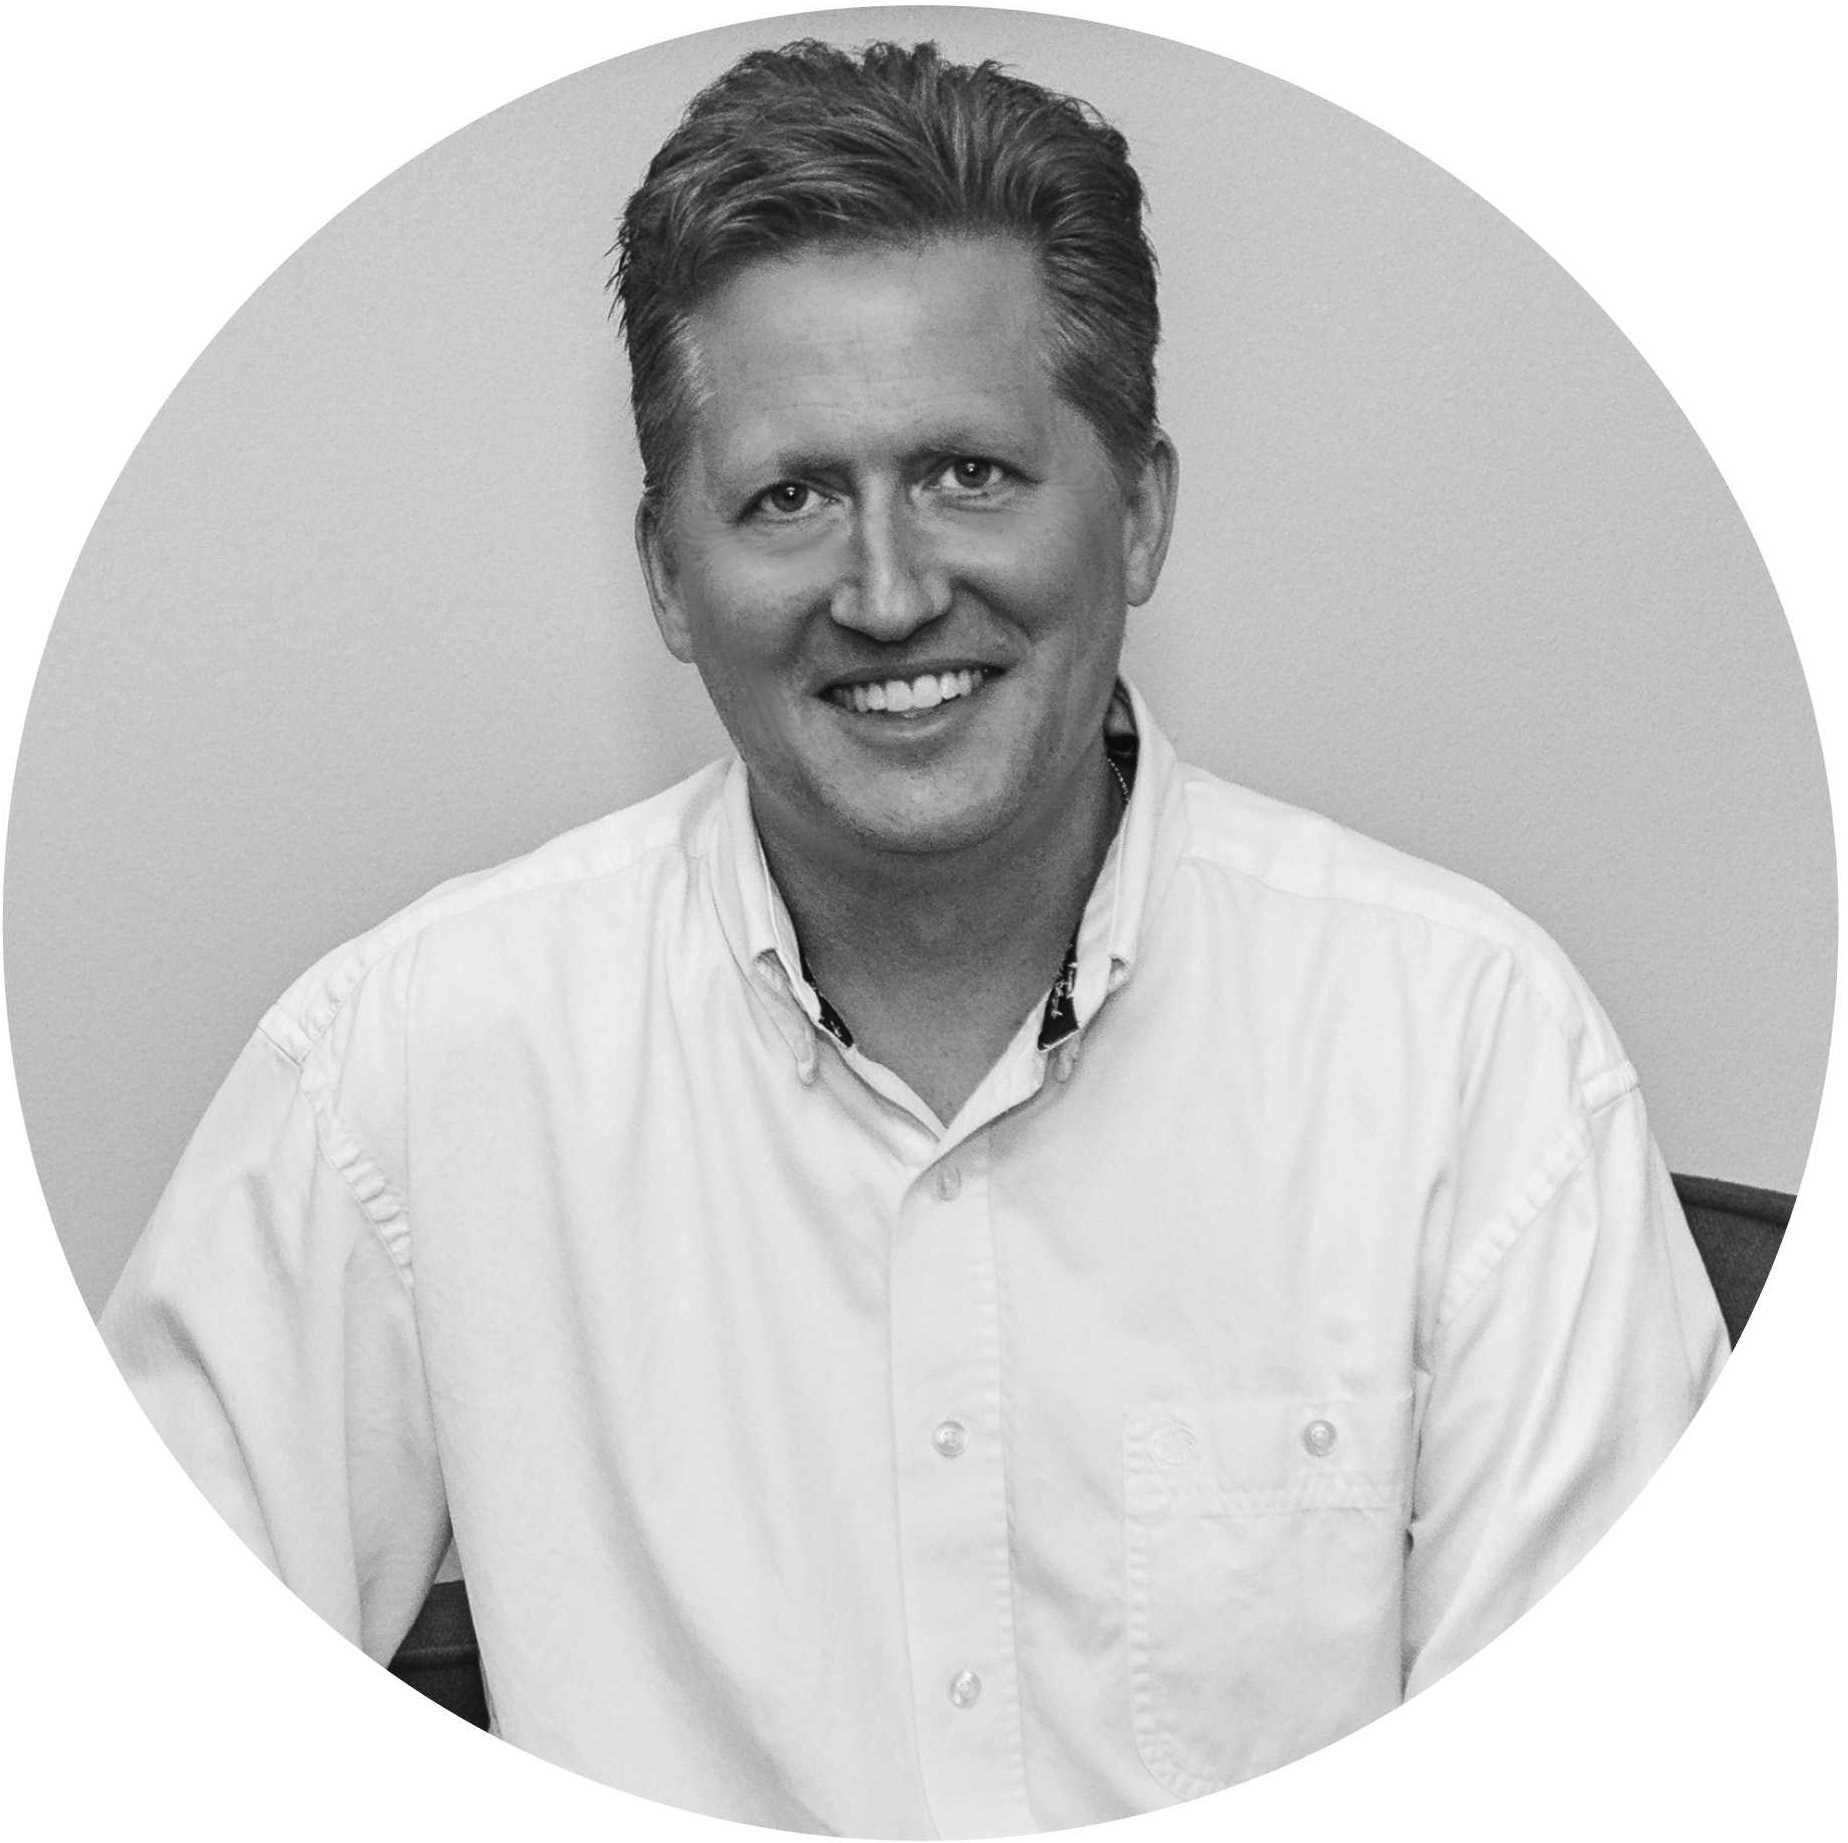 Brian Ash - Owner - Marketing Firm in Springfield Missouri